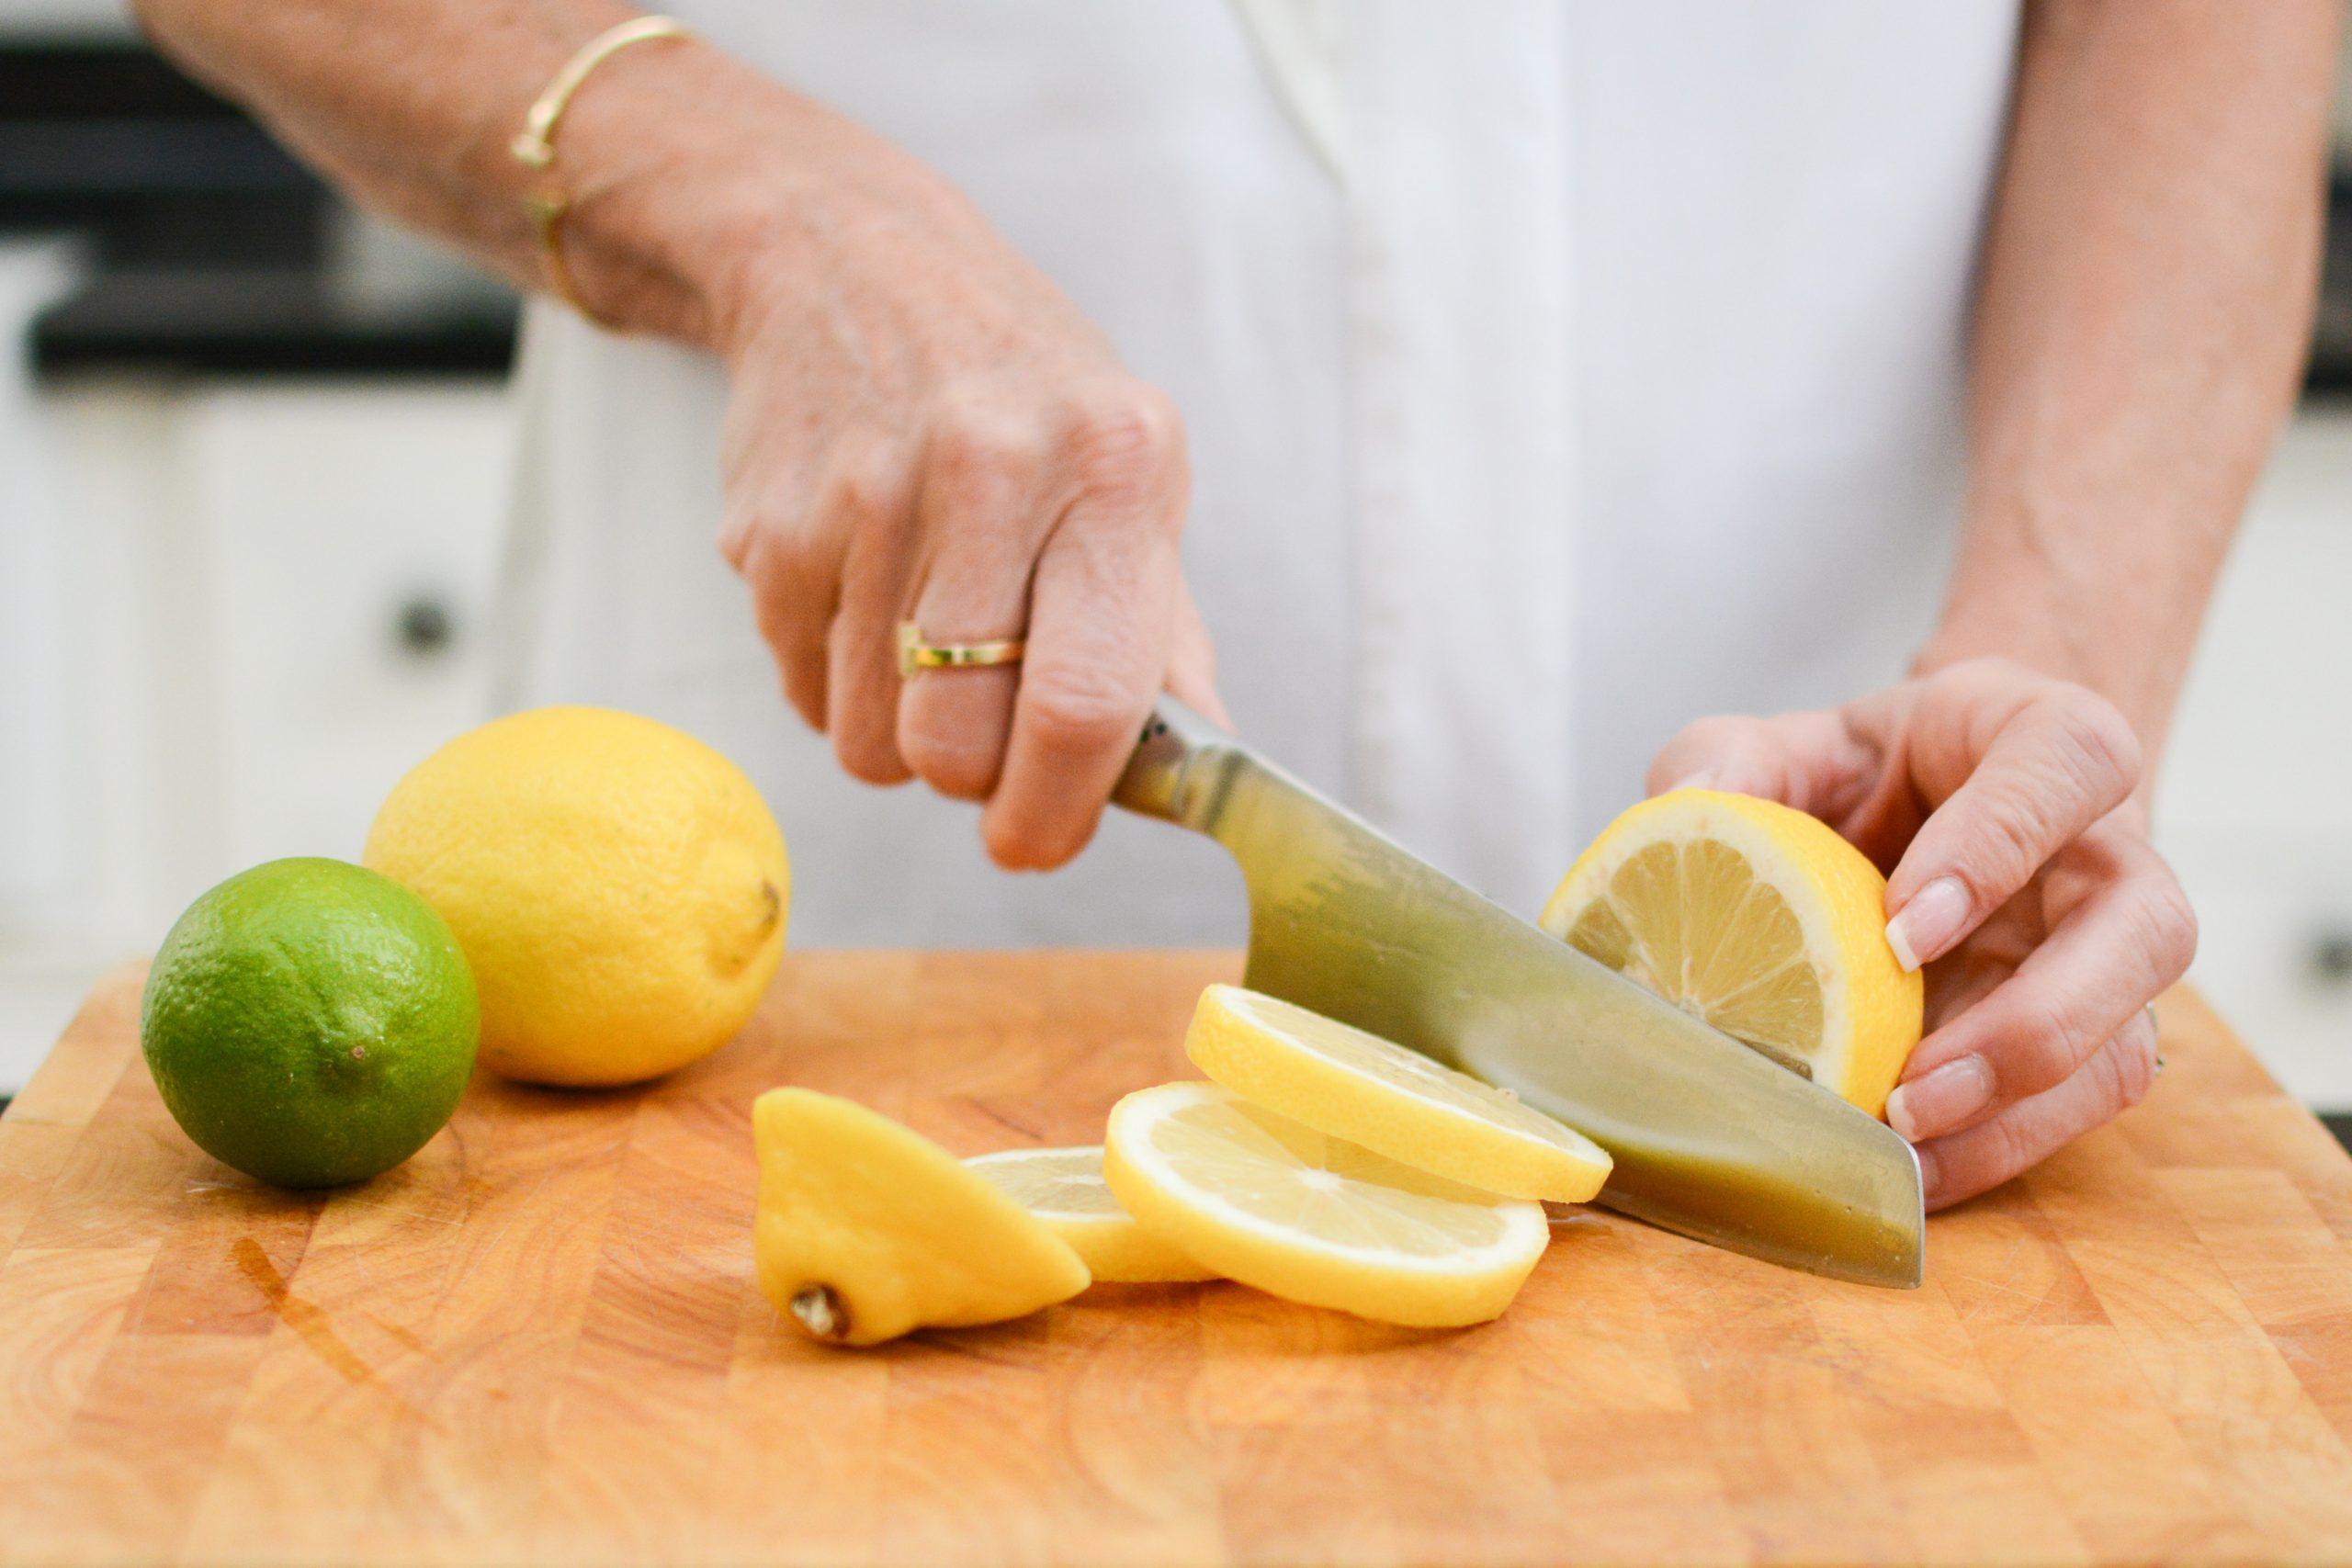 lady in white chopping lemons